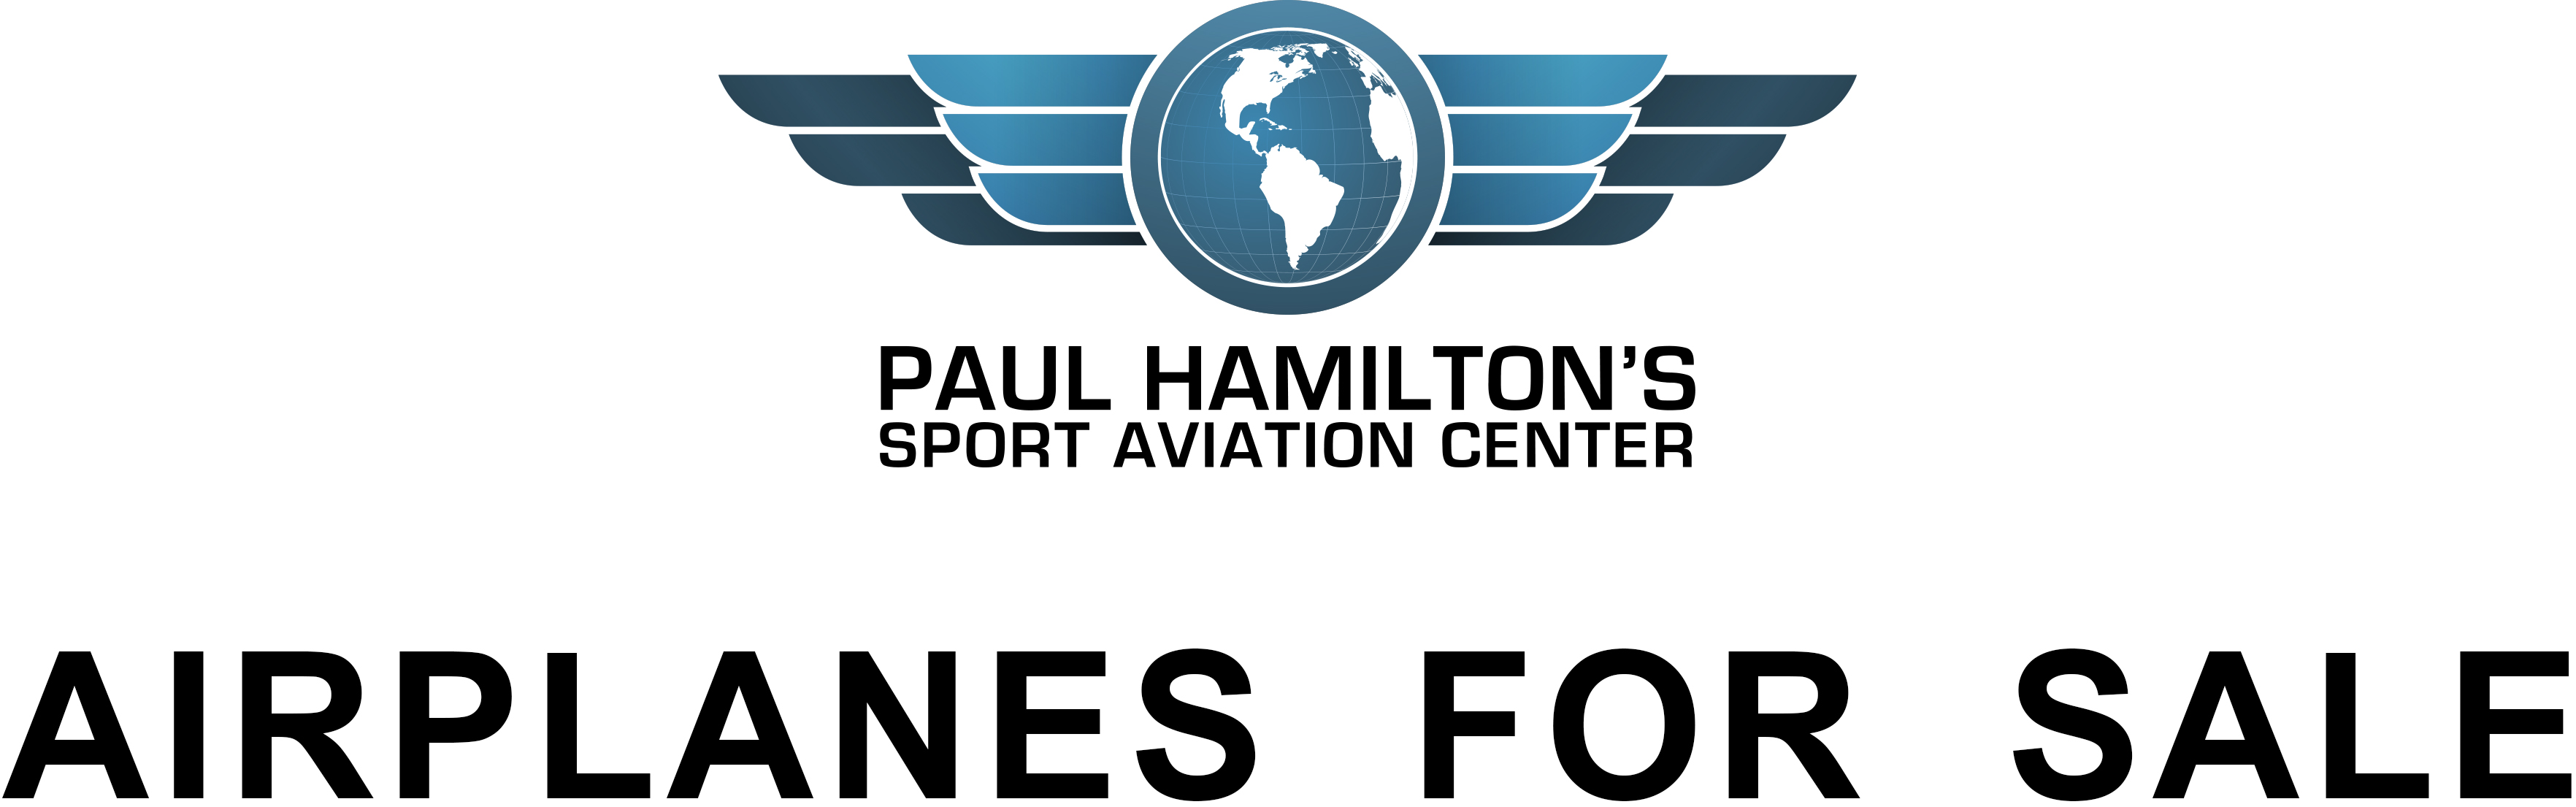 Airplanes for Sale   Paul Hamilton's Sport Aviation Center LLC